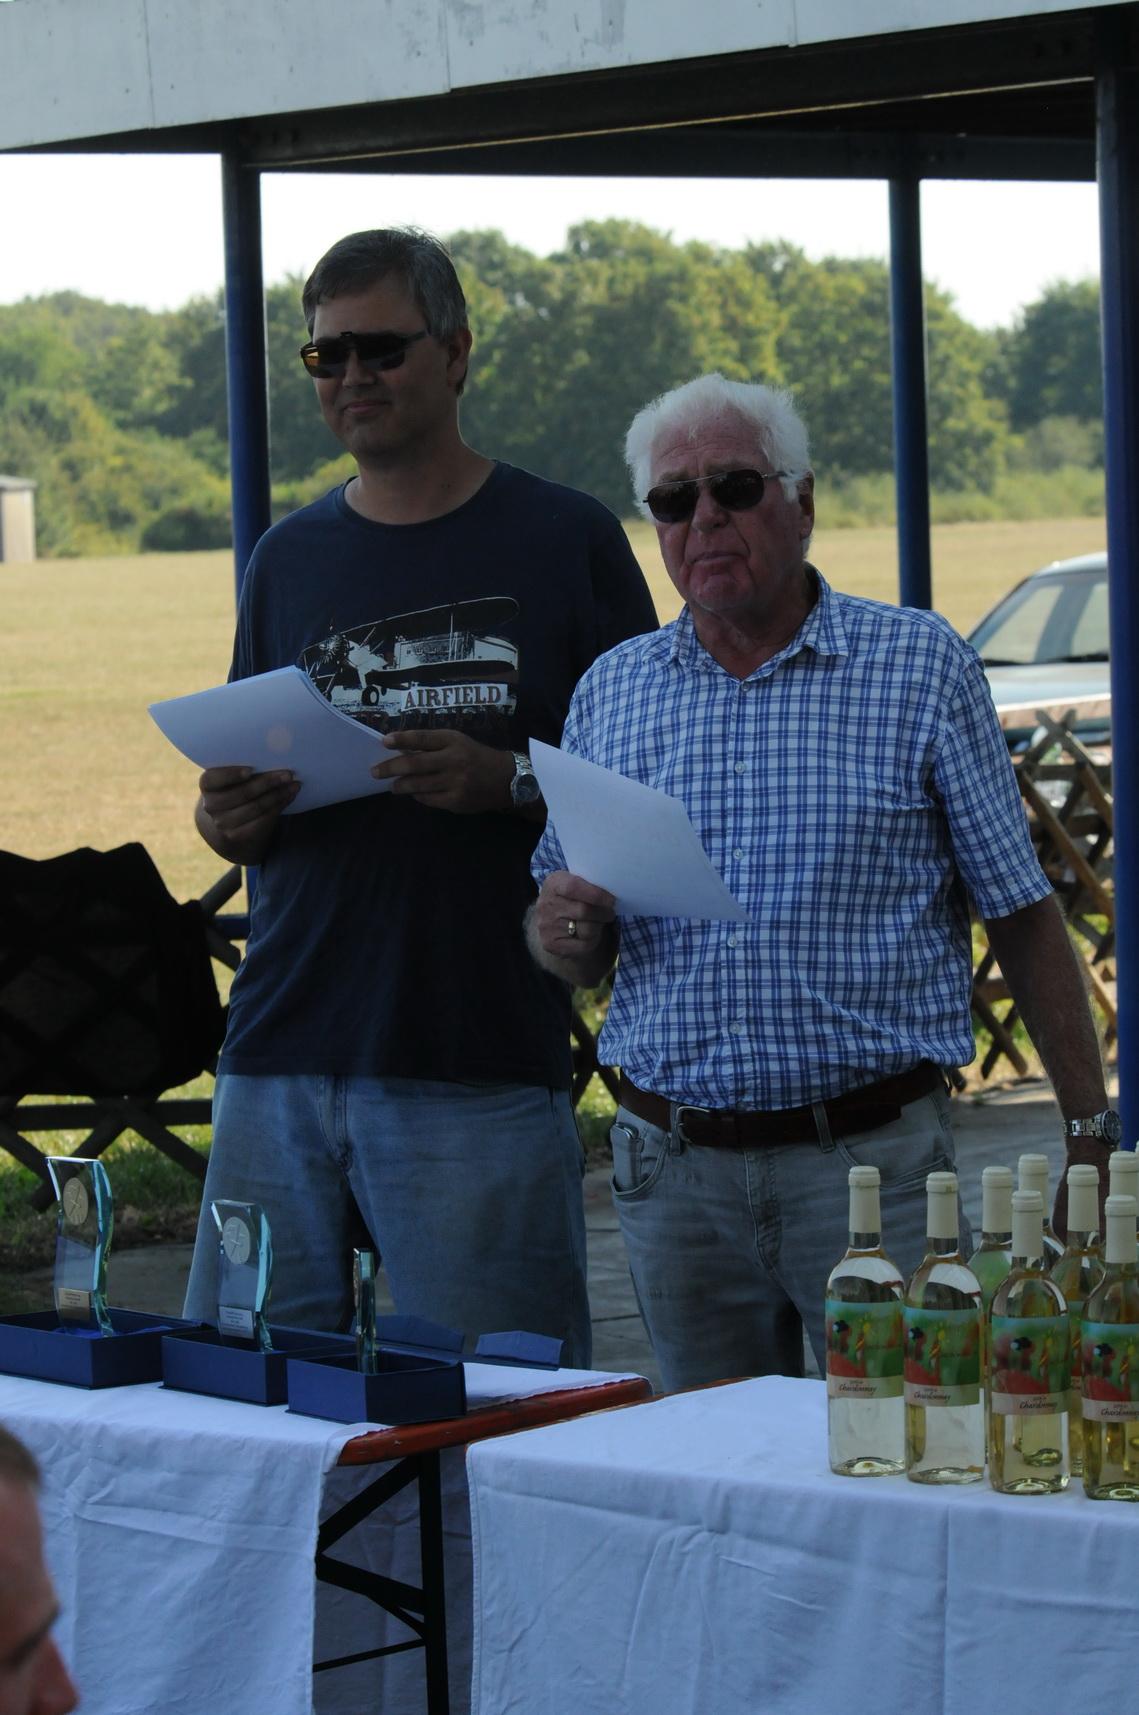 2016.08.28_RMO_0139_Suedwestdeutsche_Segelflugmeisterschaften_Bildgrosse_andern